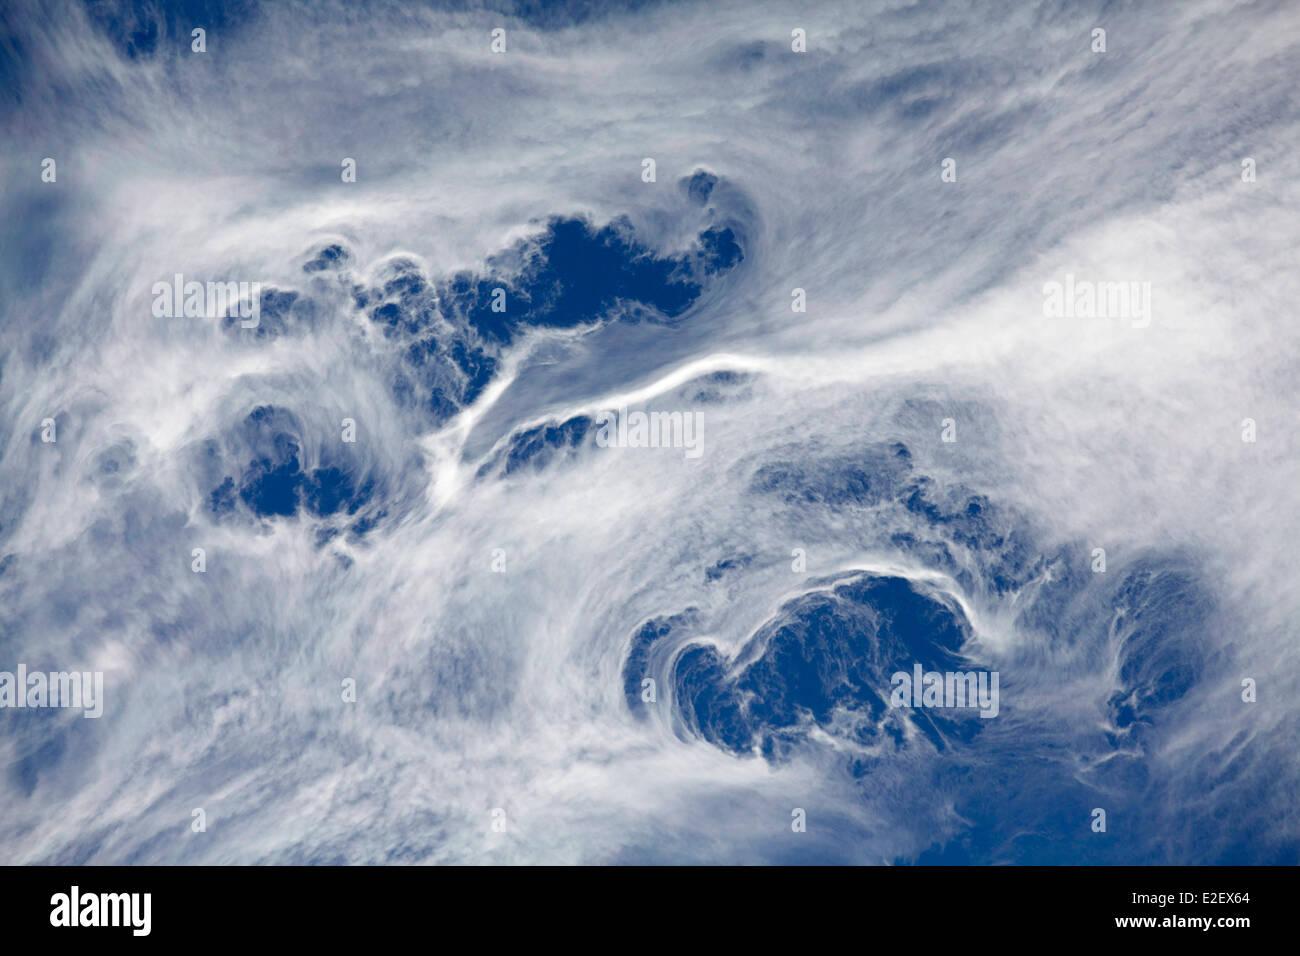 France, Haute Savoie, Chamonix, clouds movements, Chamonix valley - Stock Image